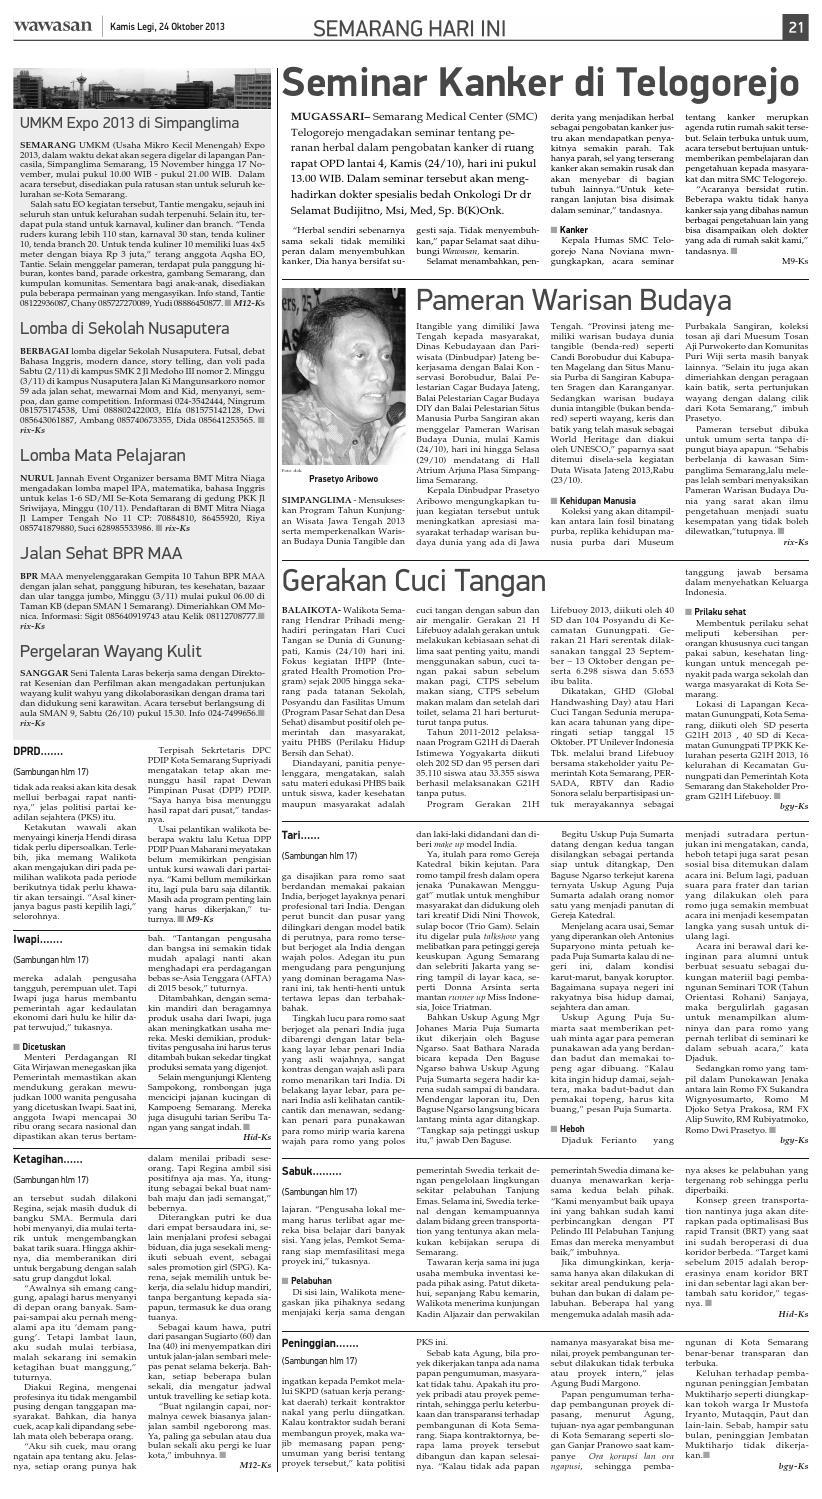 WAWASAN 24 Oktober 2013 By KORAN PAGI WAWASAN Issuu